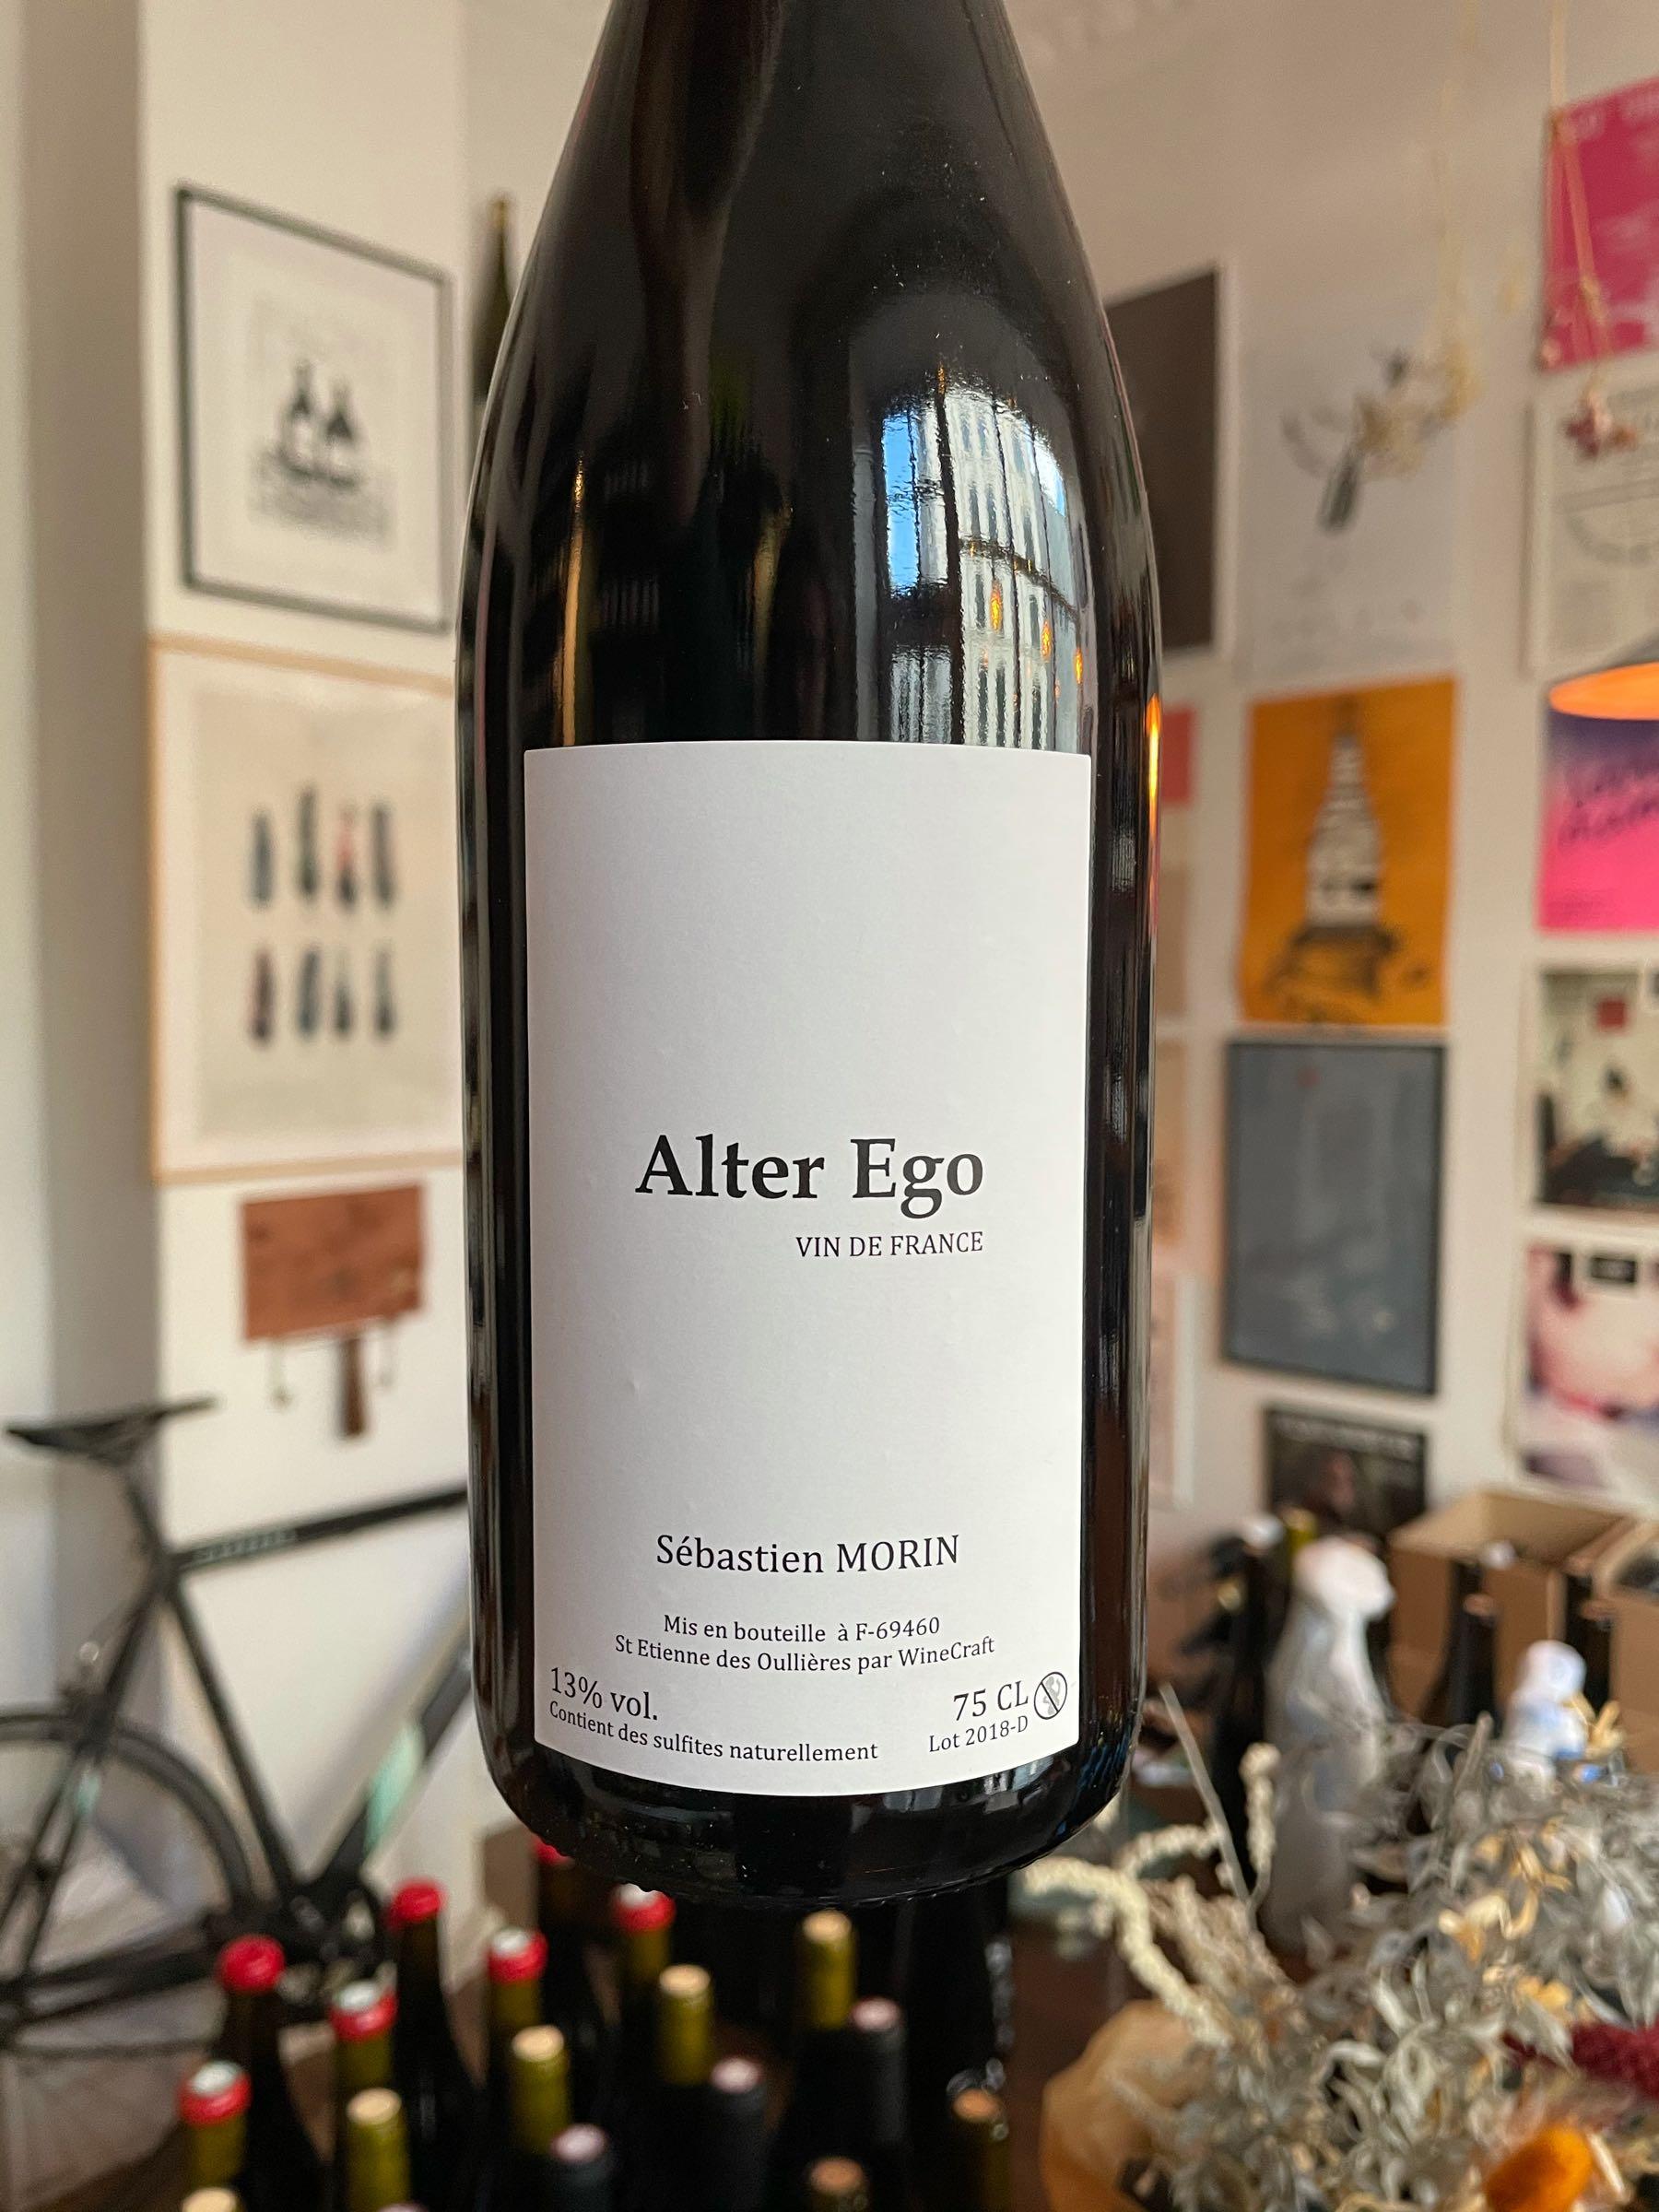 Alter Ego 2018 - Sebastien Morin